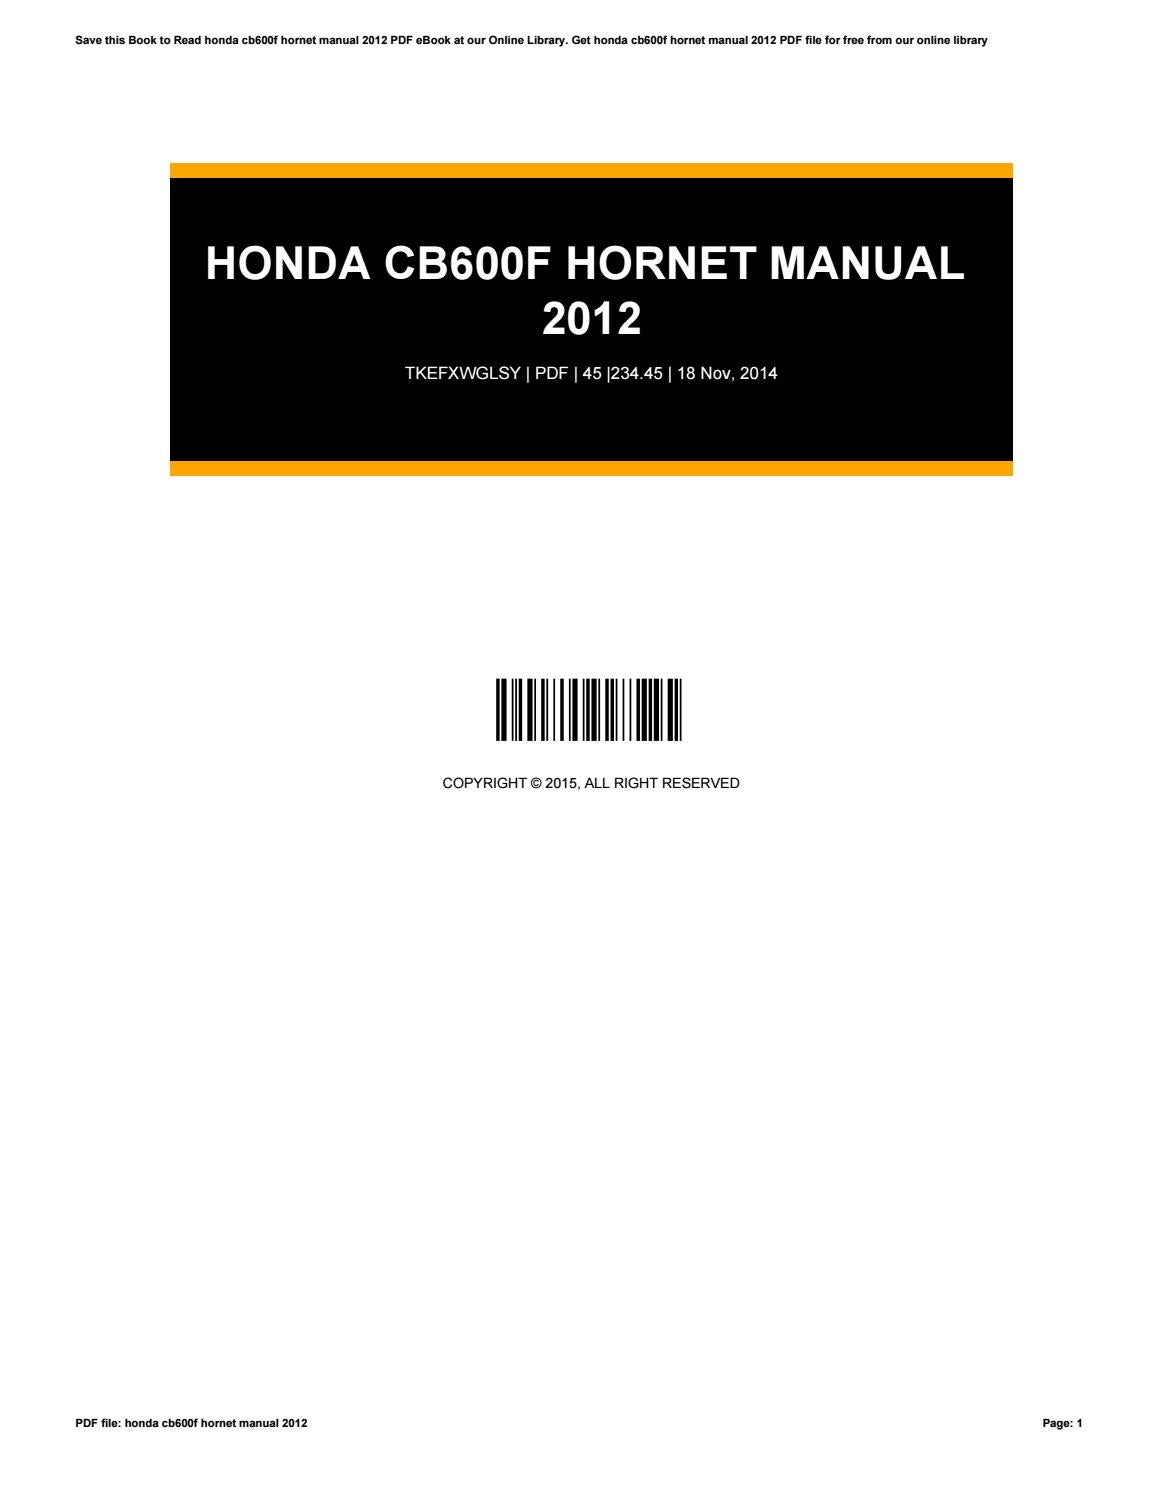 Honda Cb600f Hornet Manual 2012 Model Cbf 600 Wiring Diagram Algae Temperature Diagrams